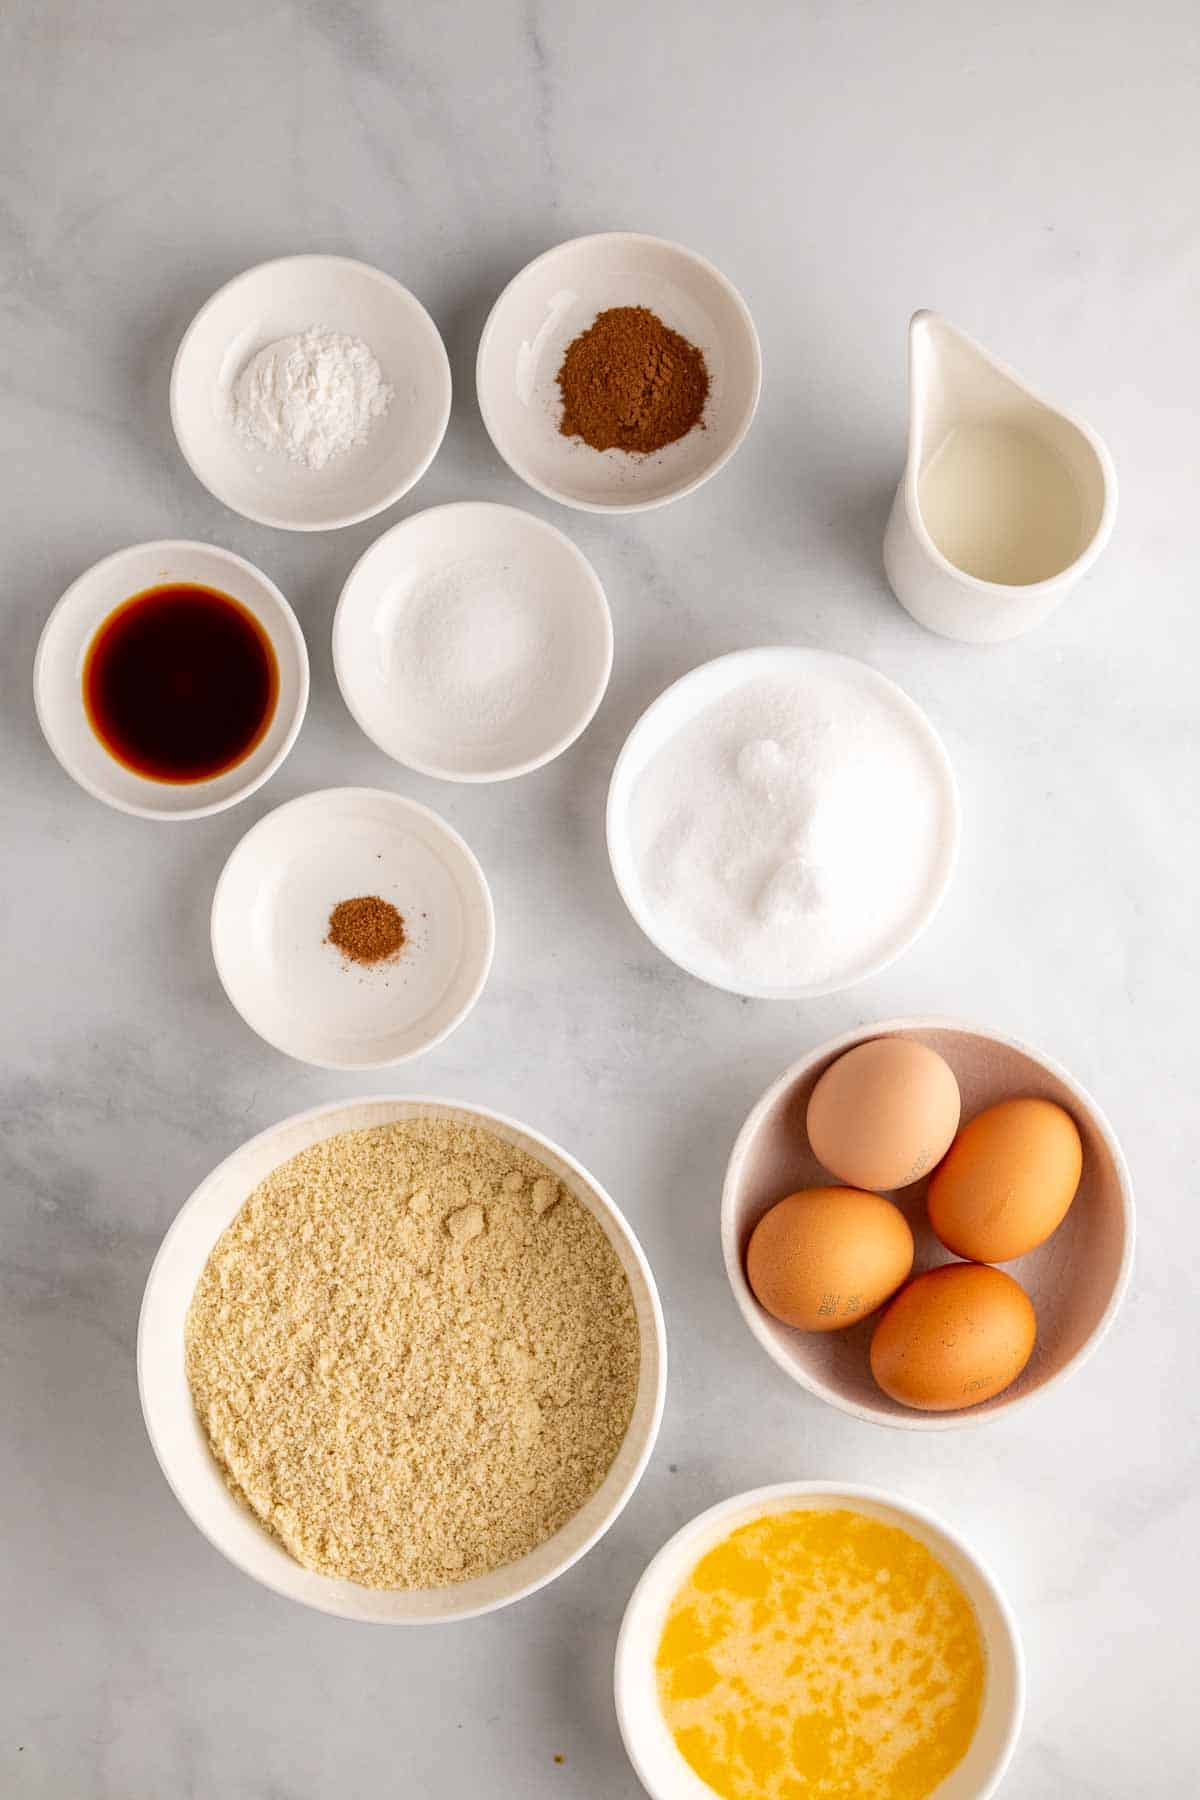 Donut ingredients in separate ramekins, as seen from above